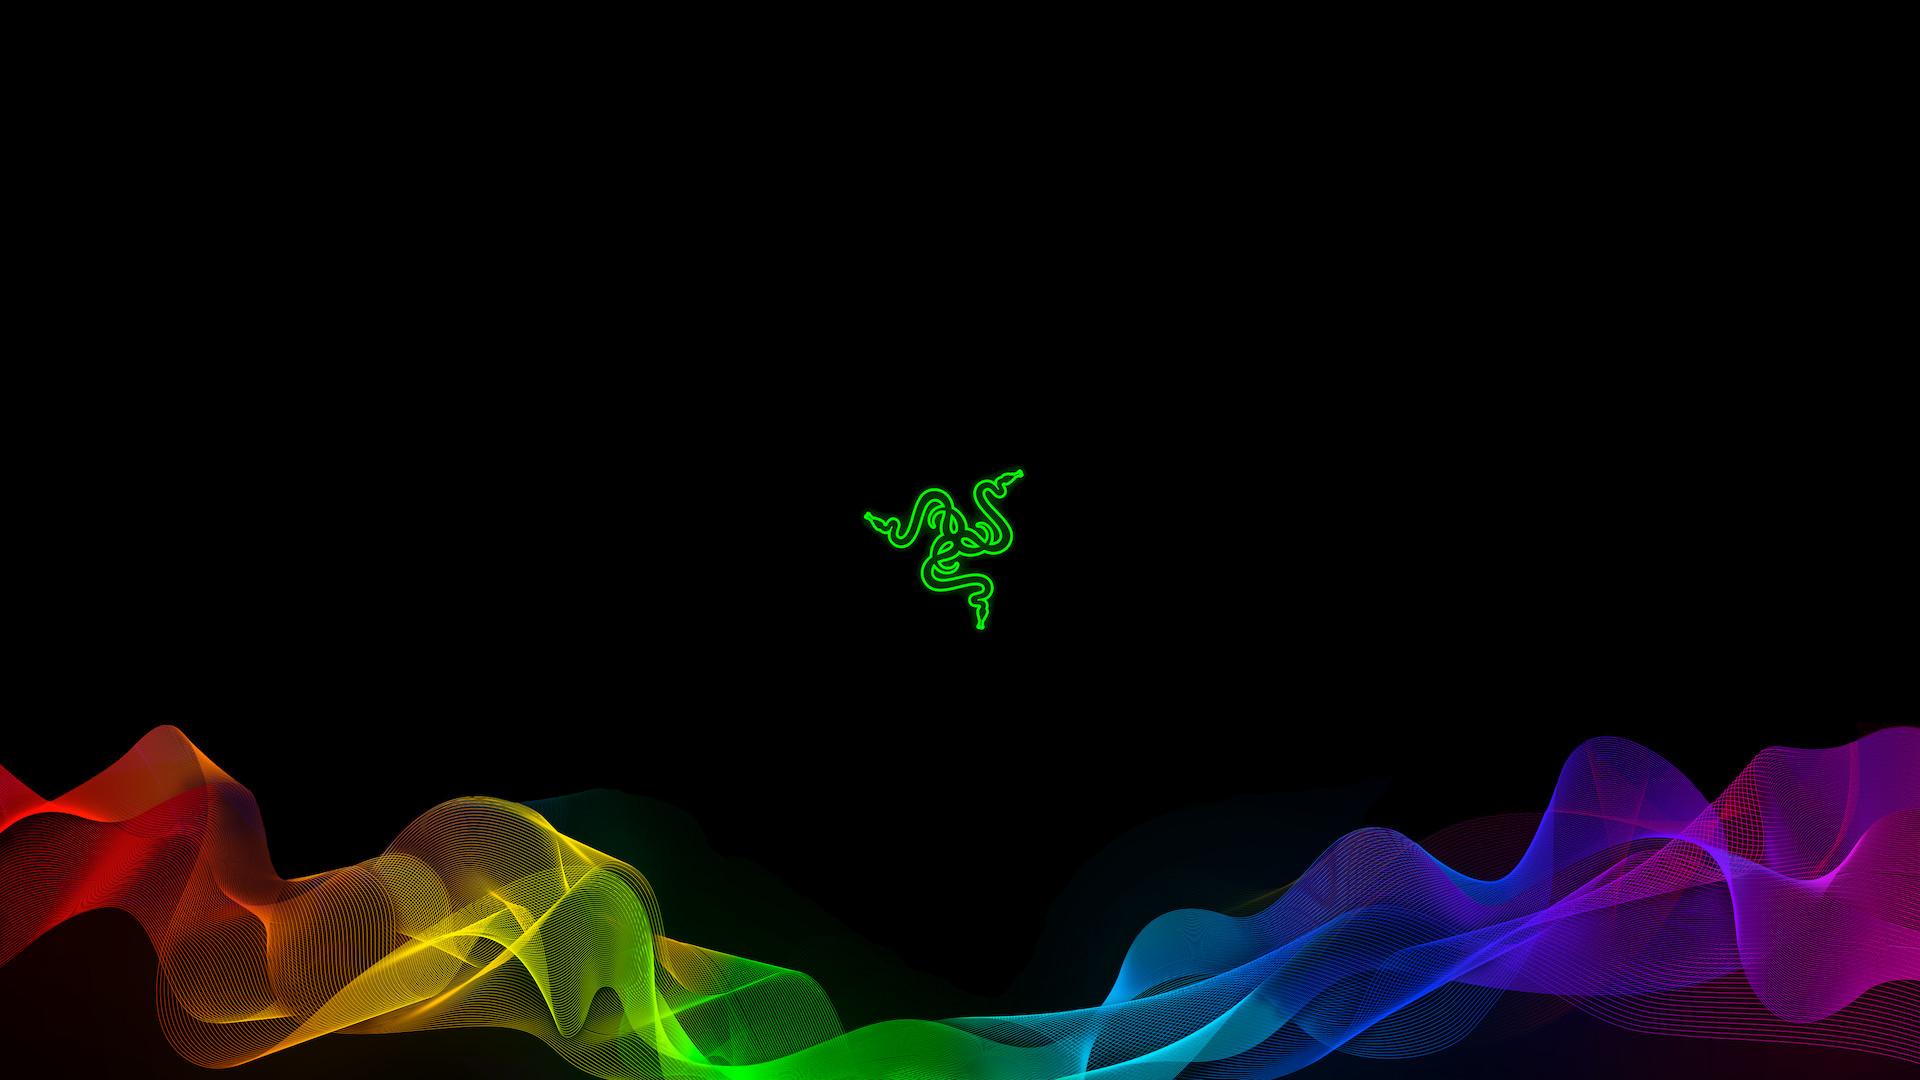 Razer Background 78 Pictures